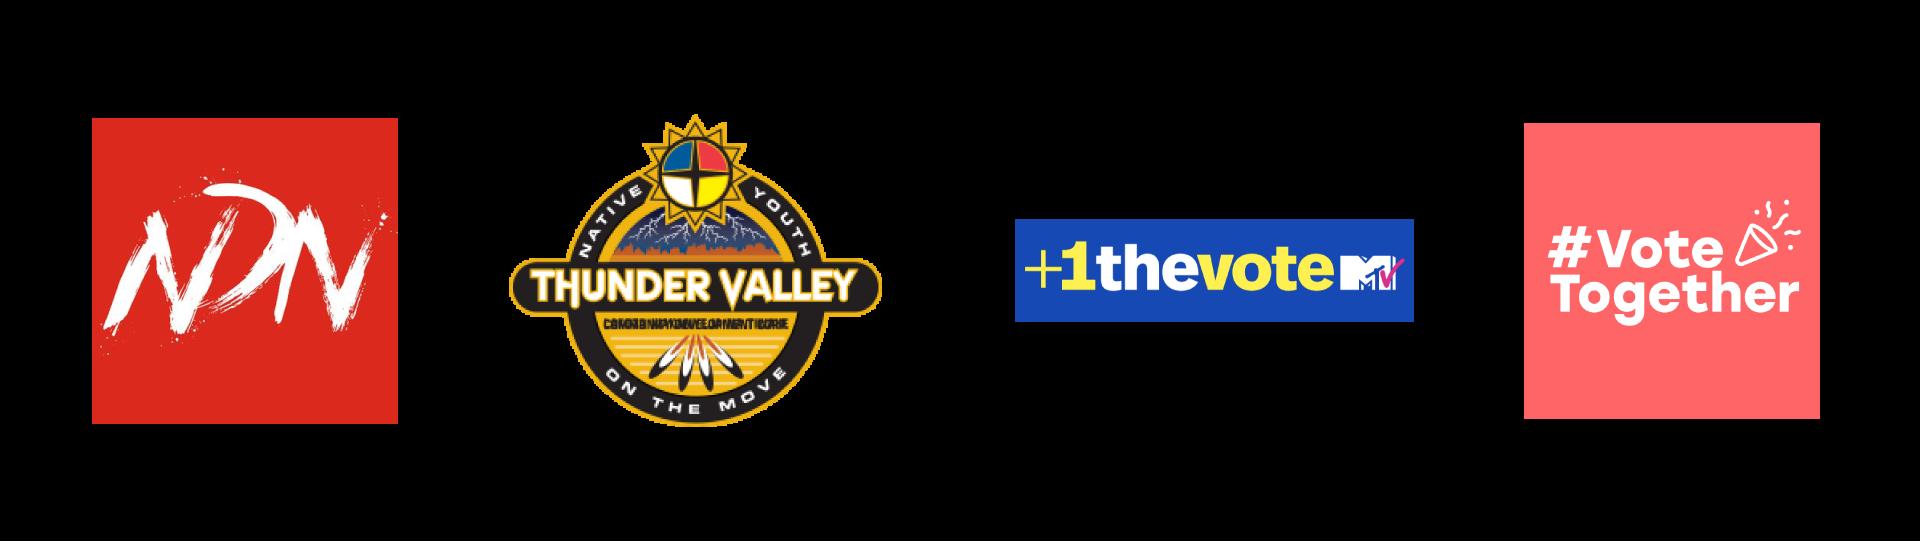 FRESH-Function-Sponsors-SoDak-NDN-Thunder-Valley-CDC-MTV-plus-one-the-vote.png